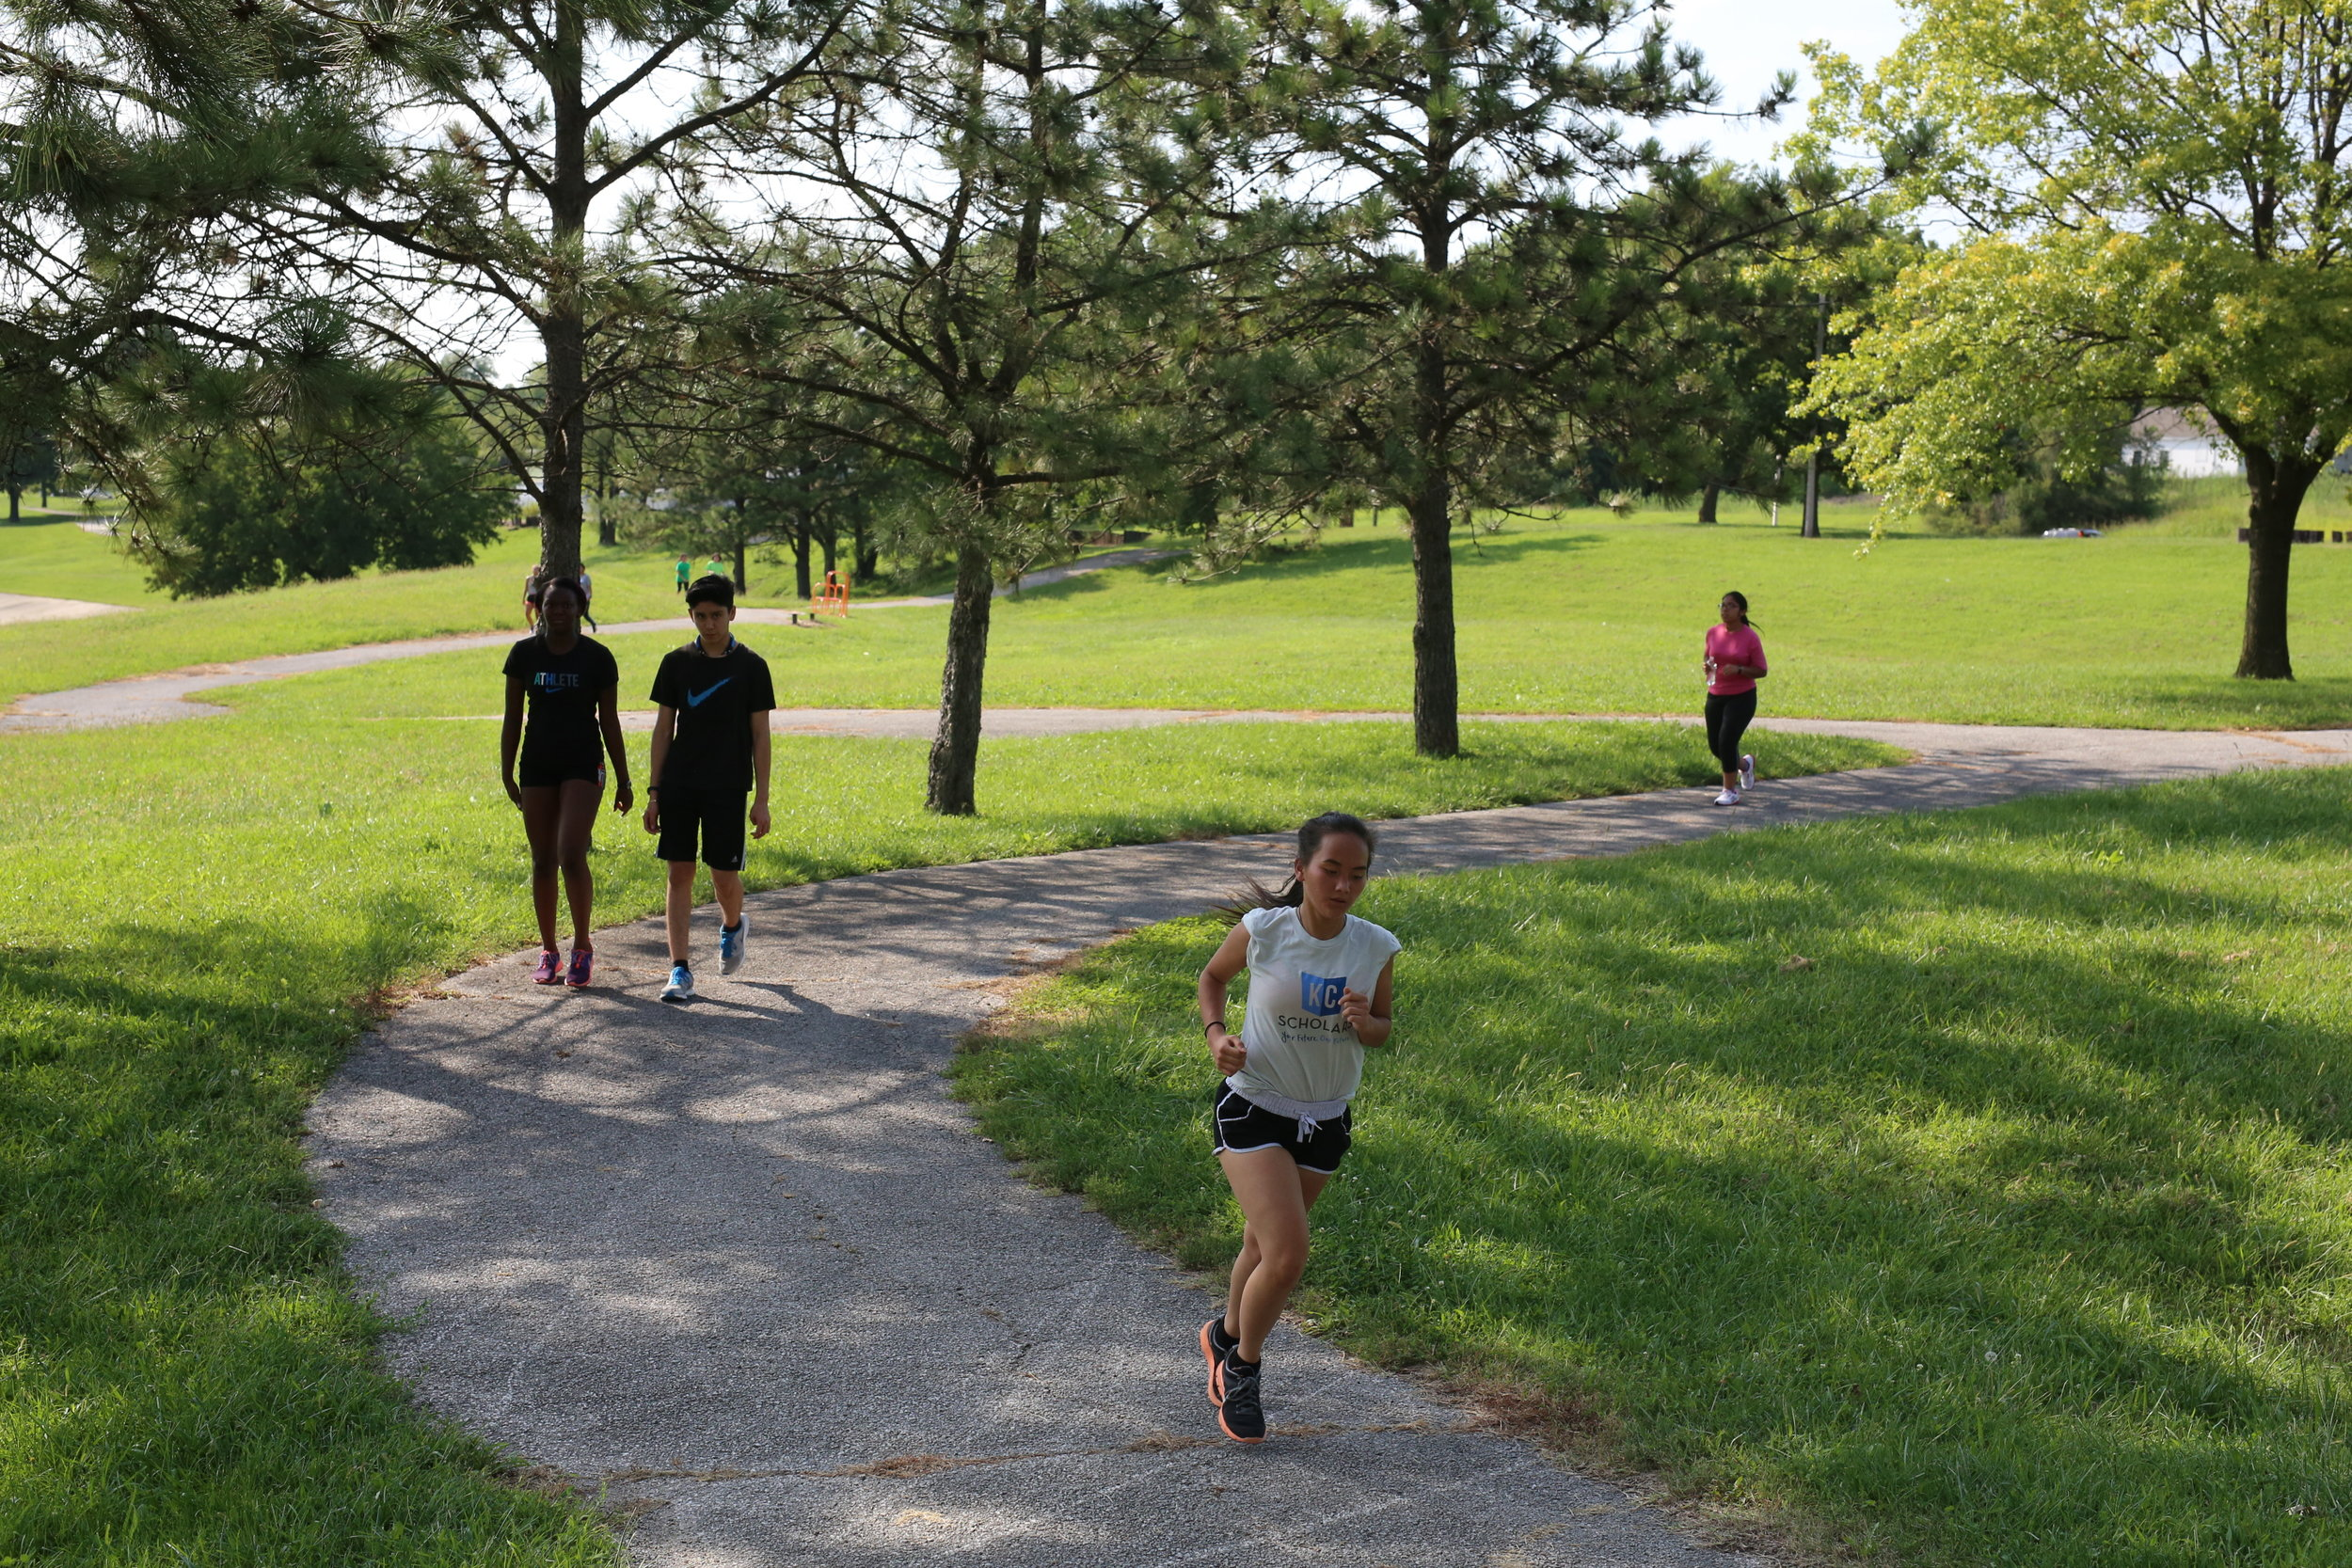 Cross-country runners take the Jersey Creek Trail through Heathwood Park three days a week.